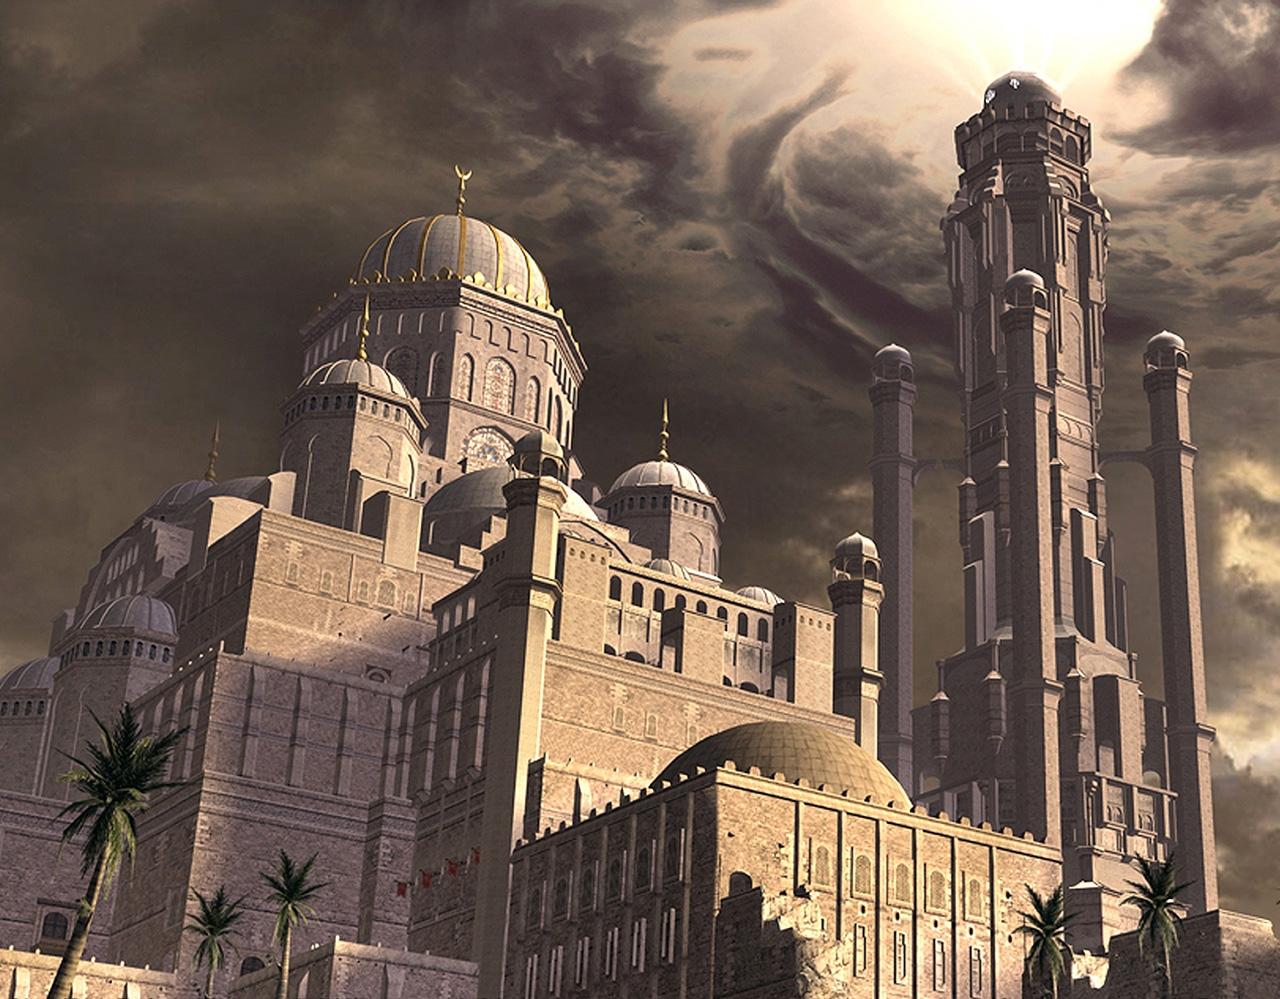 Prince Of Persia 3d Wallpaper Memorias Retro Prince Of Persia